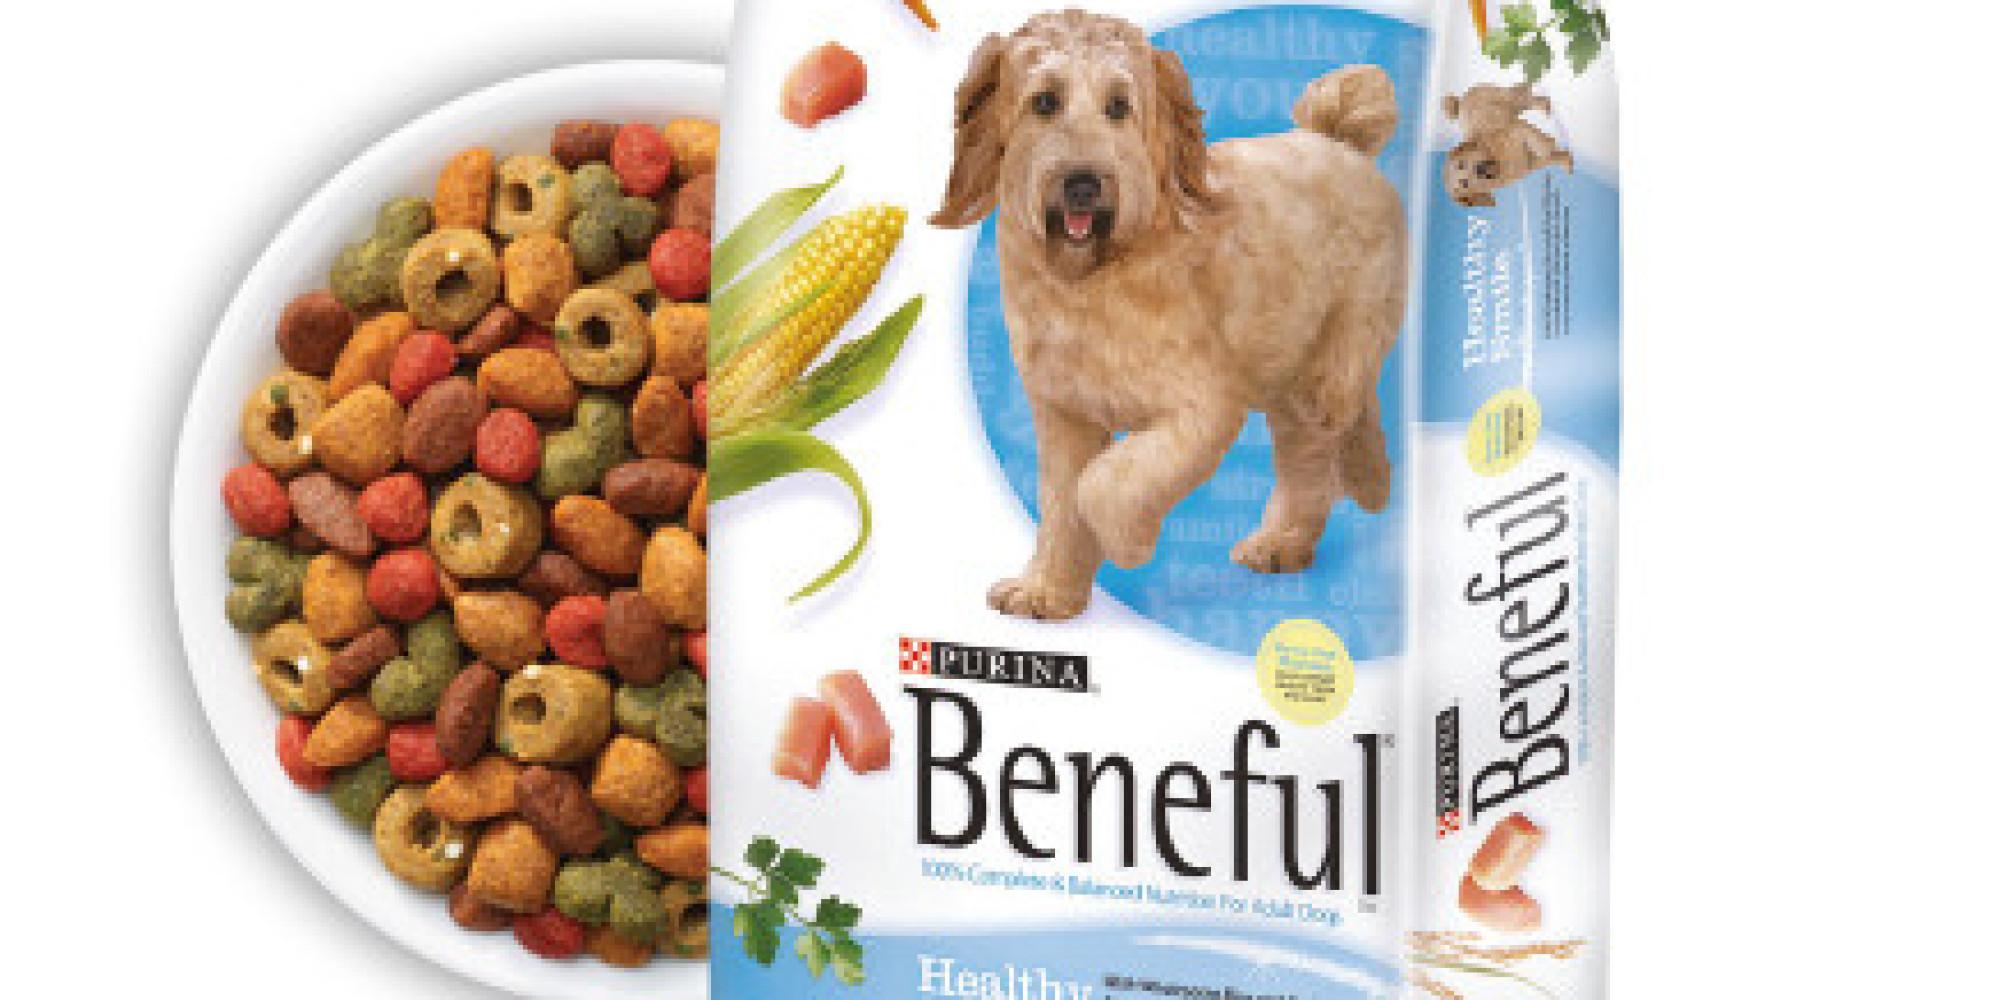 Purina Dog Food South Africa